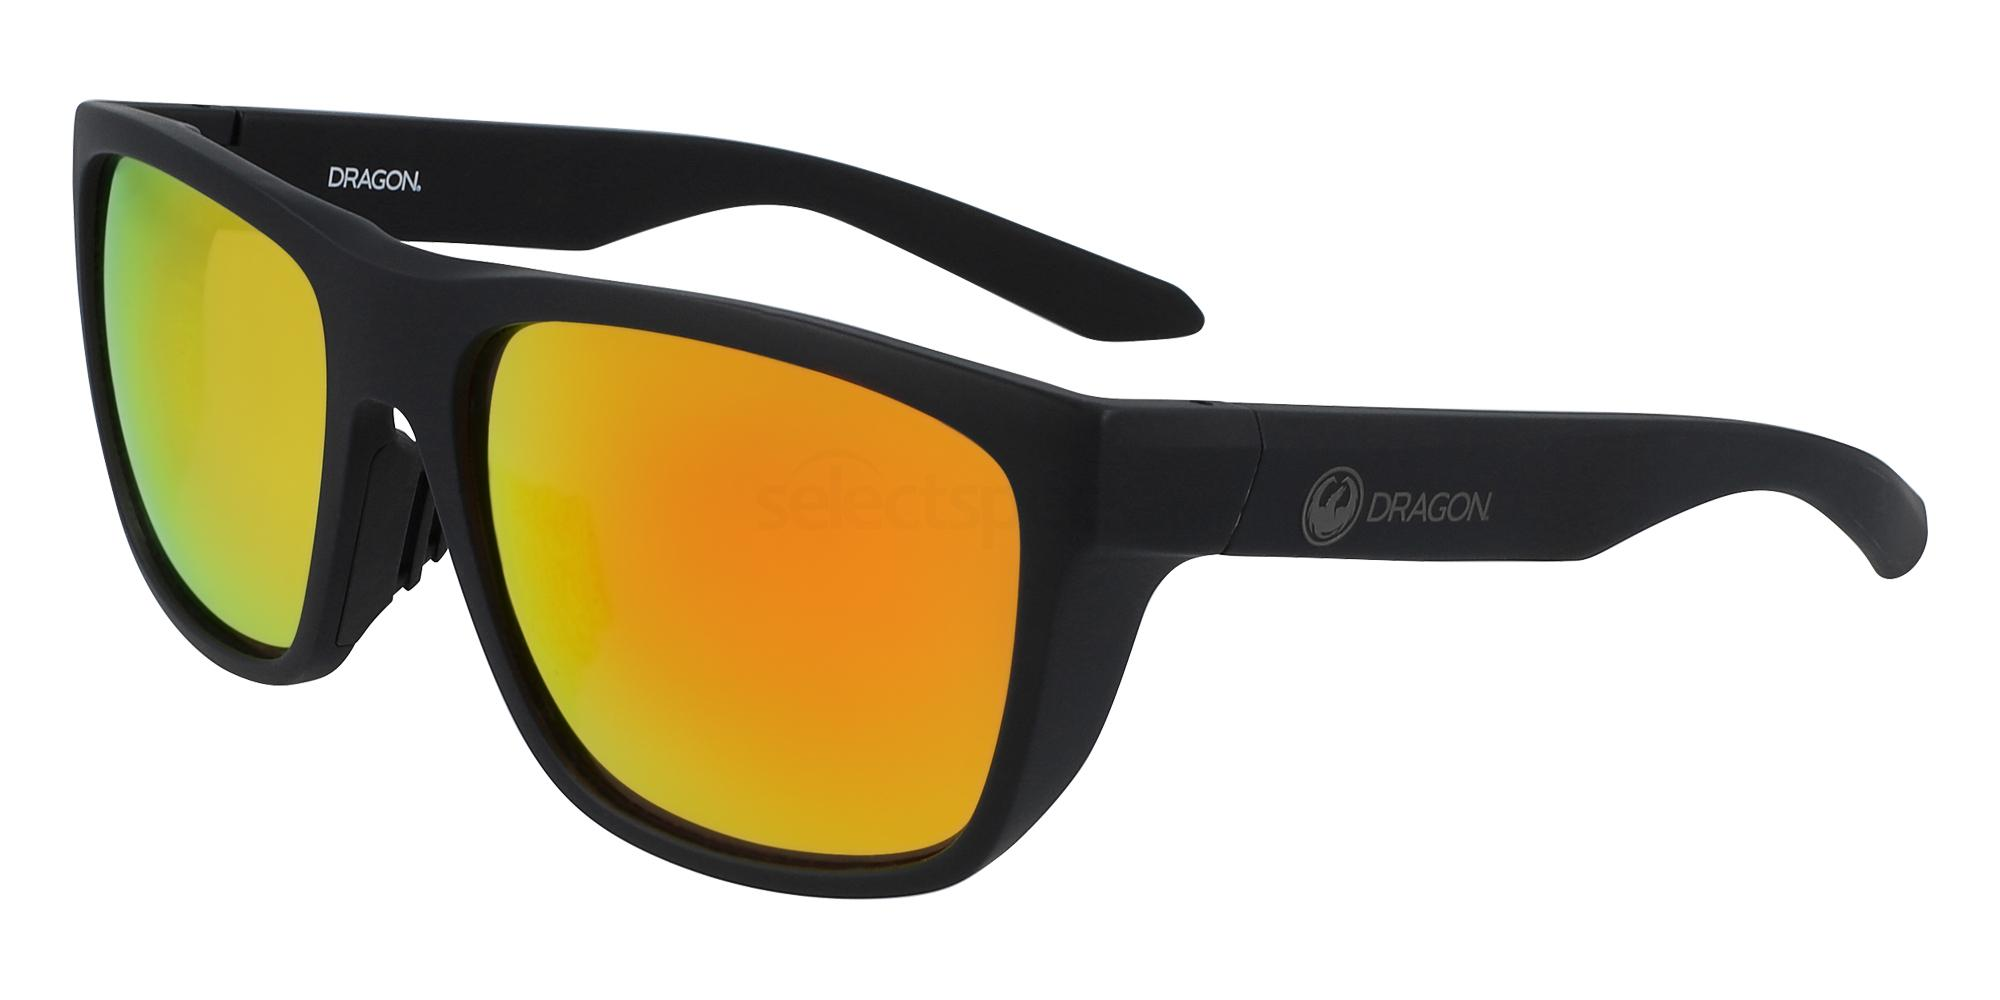 022 DR AERIAL ION Sunglasses, Dragon